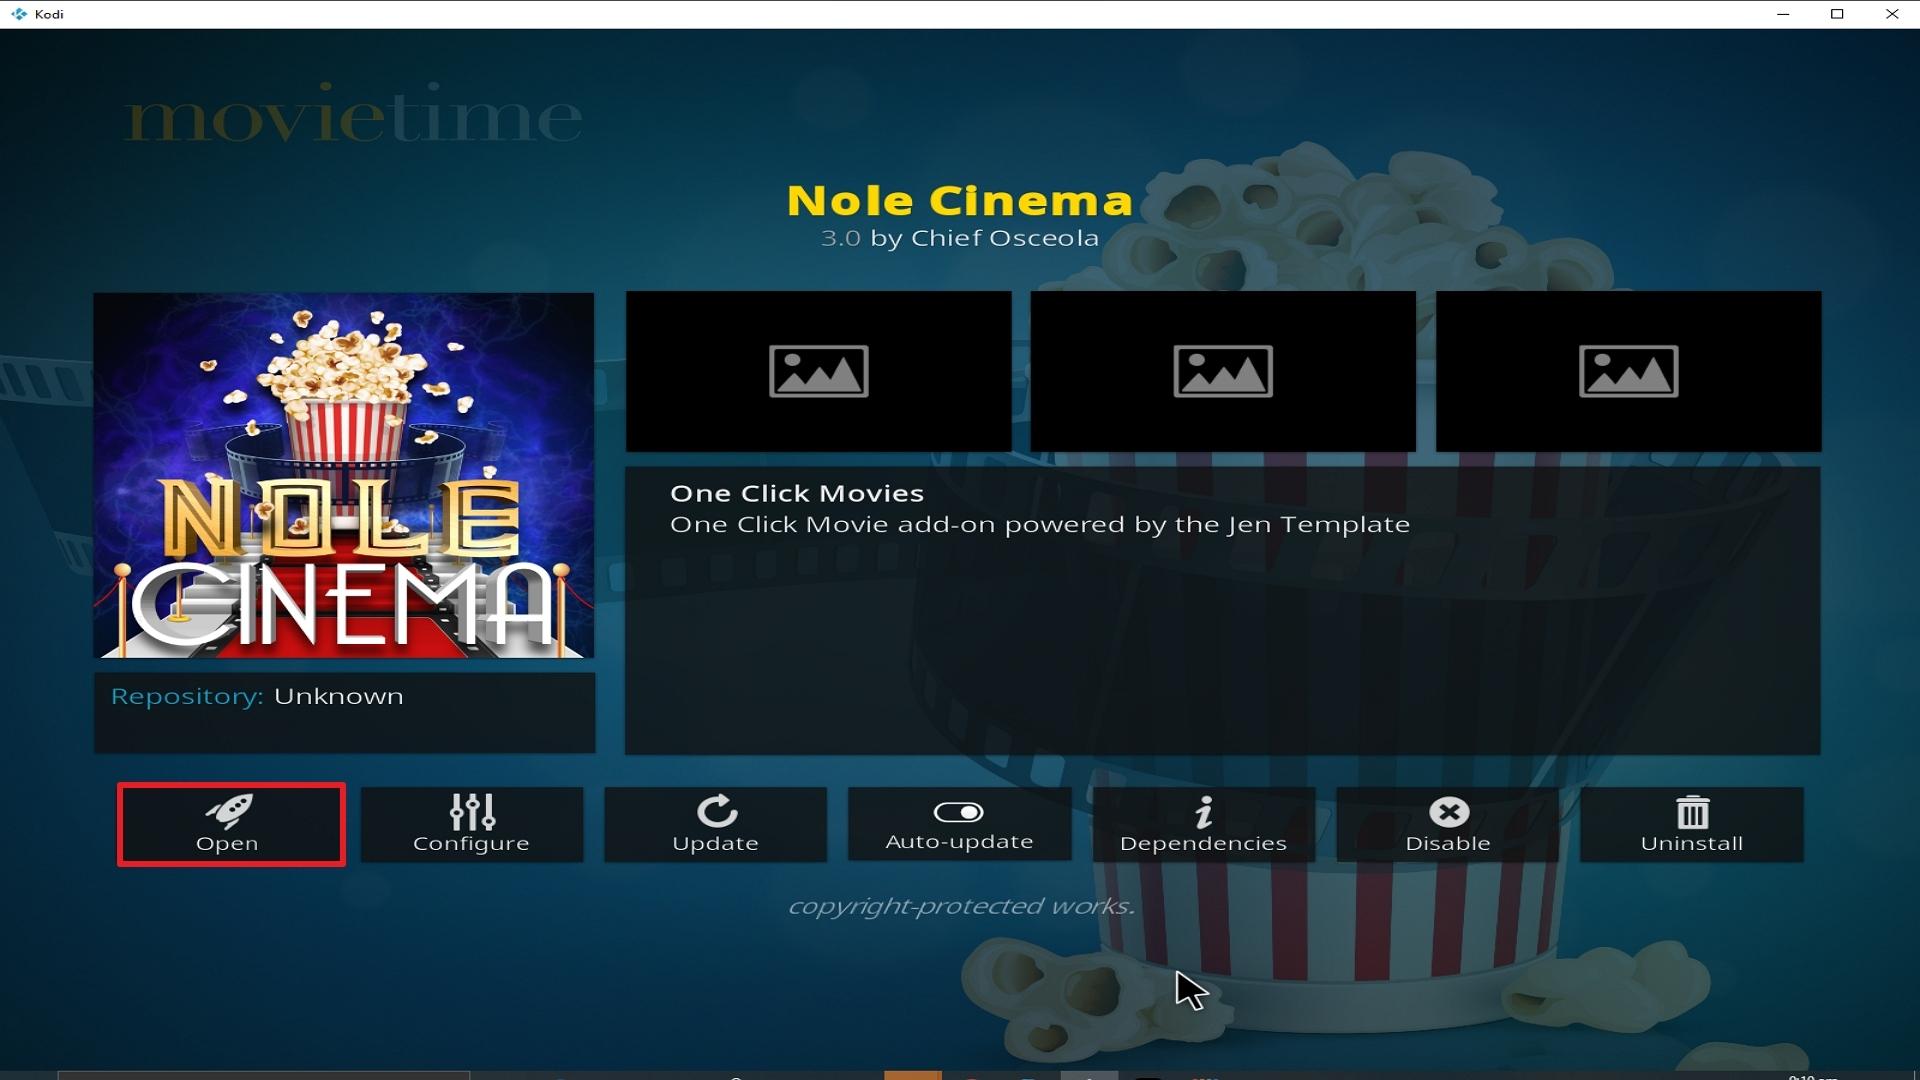 Step 26 Installing Nole Cinema addon on Kodi